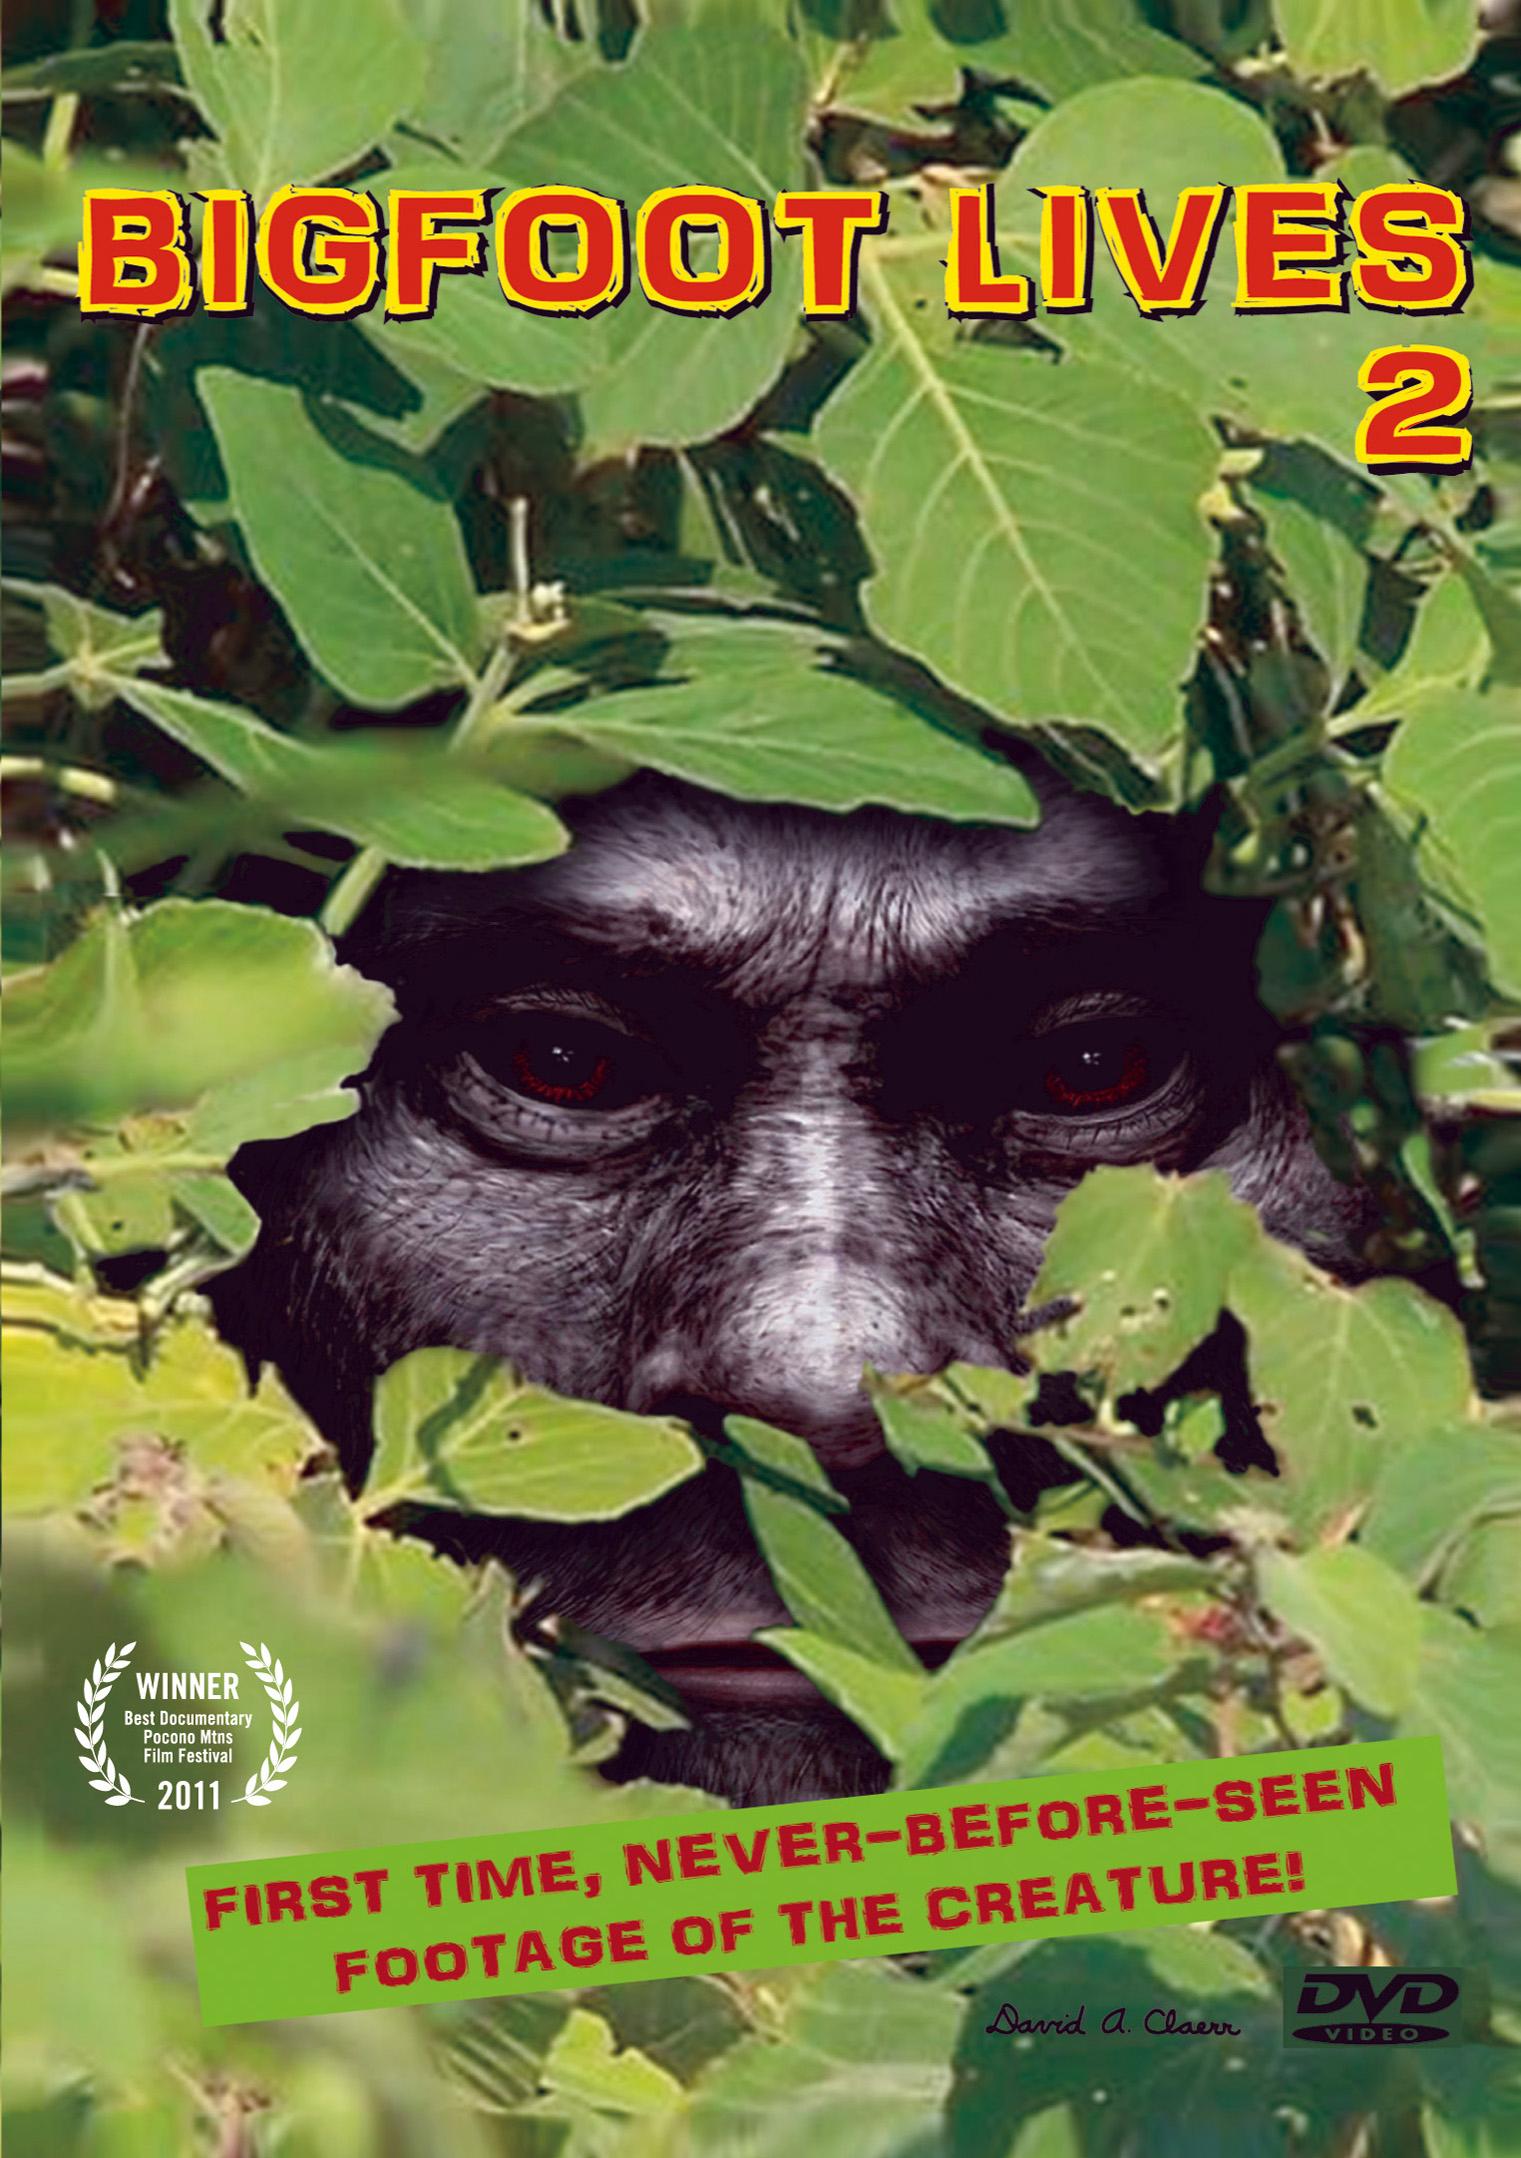 Bigfoot Lives 2